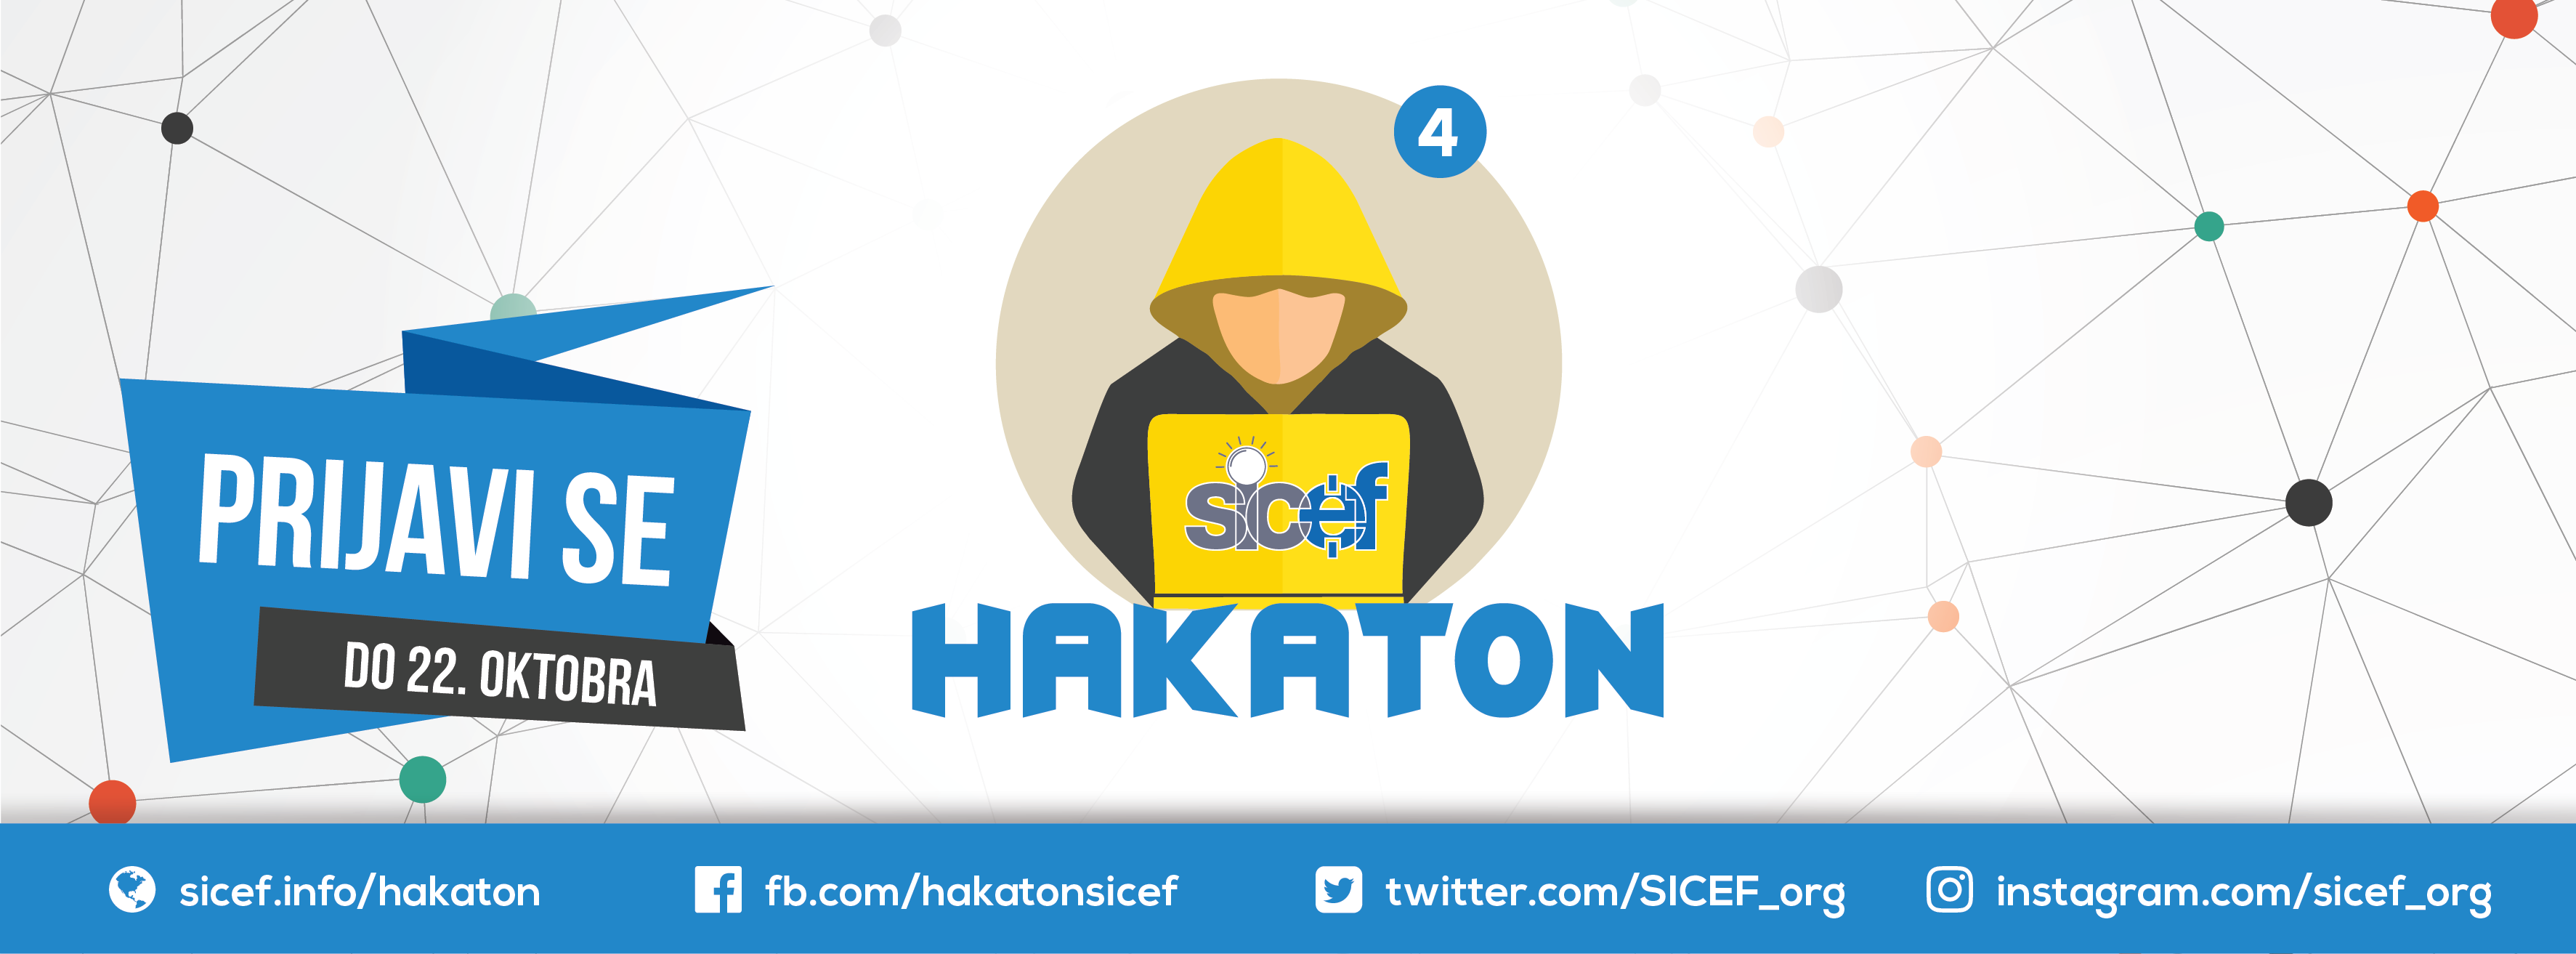 SICEF Hakaton